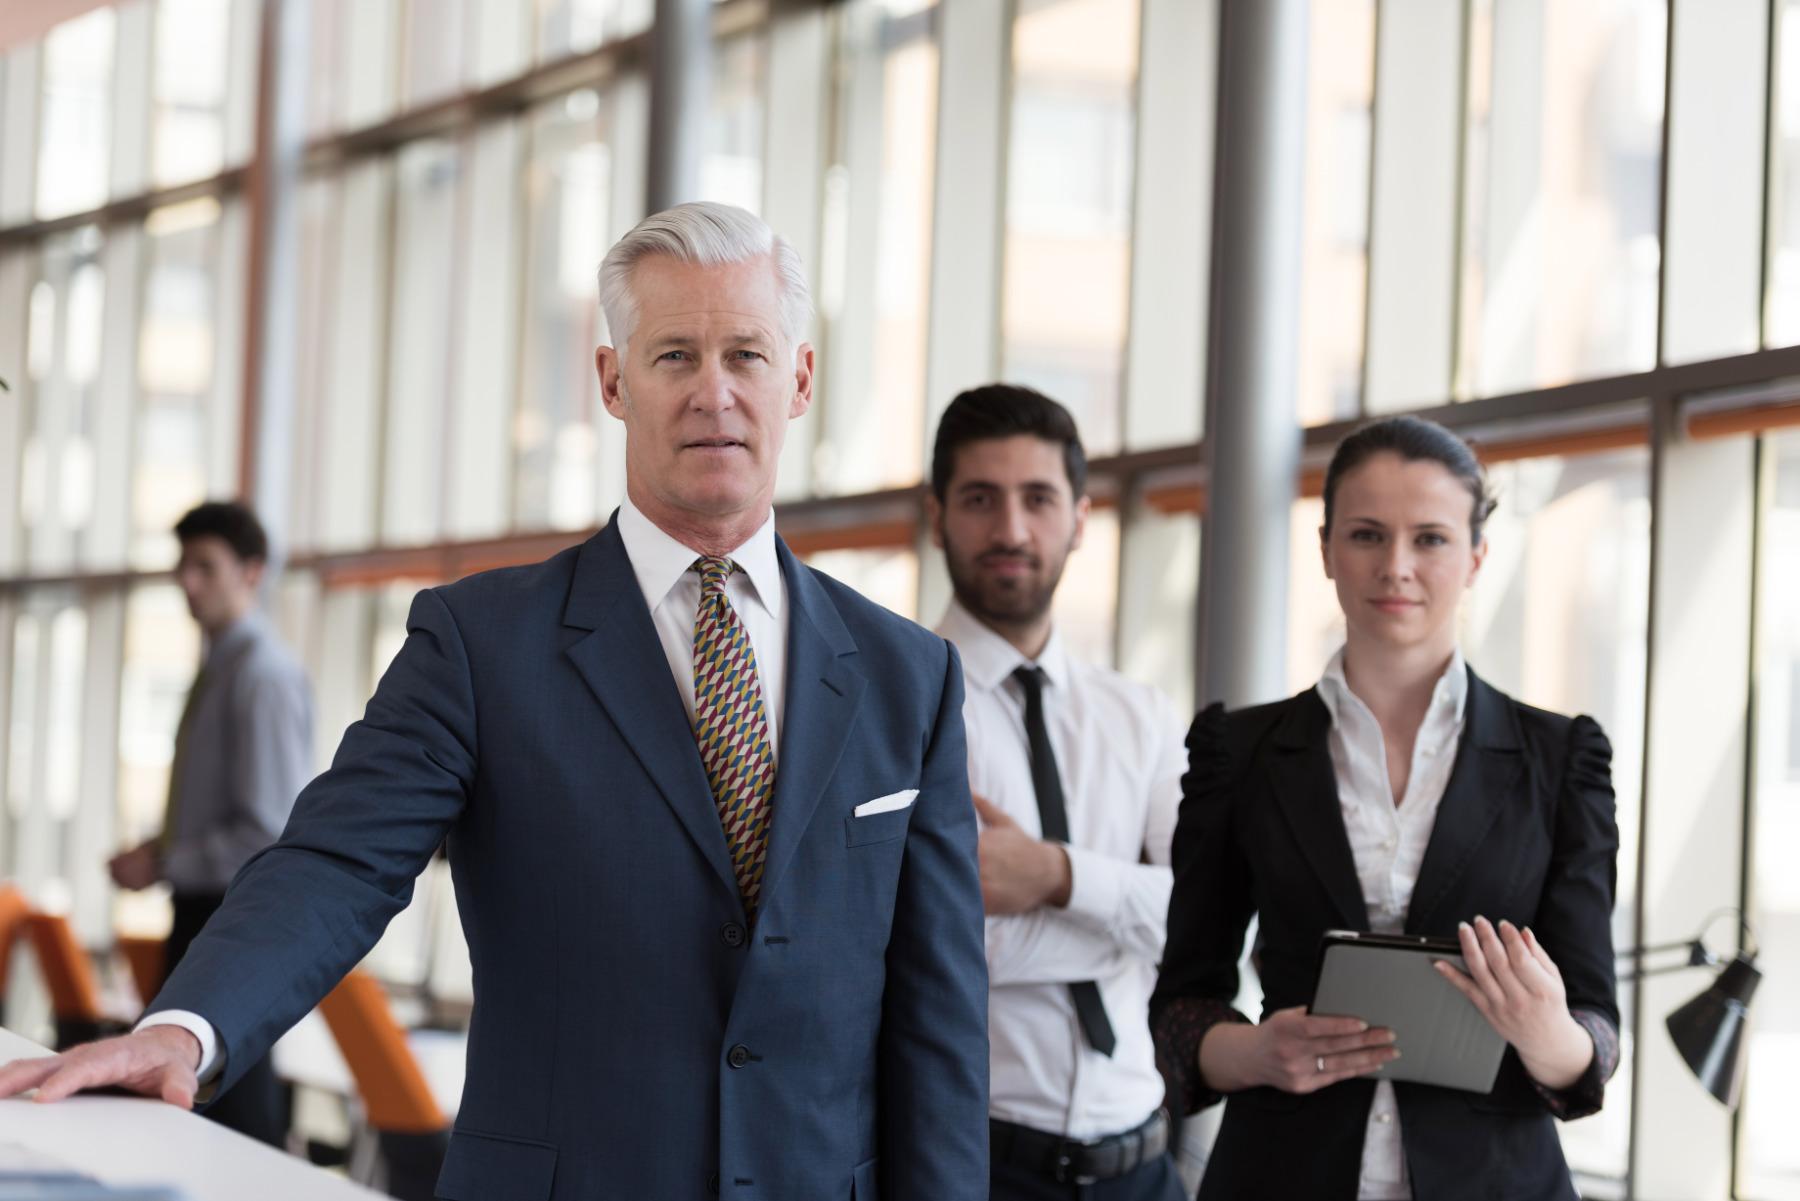 Portrait,Of,Senior,Businessman,As,Leader,At,Modern,Bright,Office